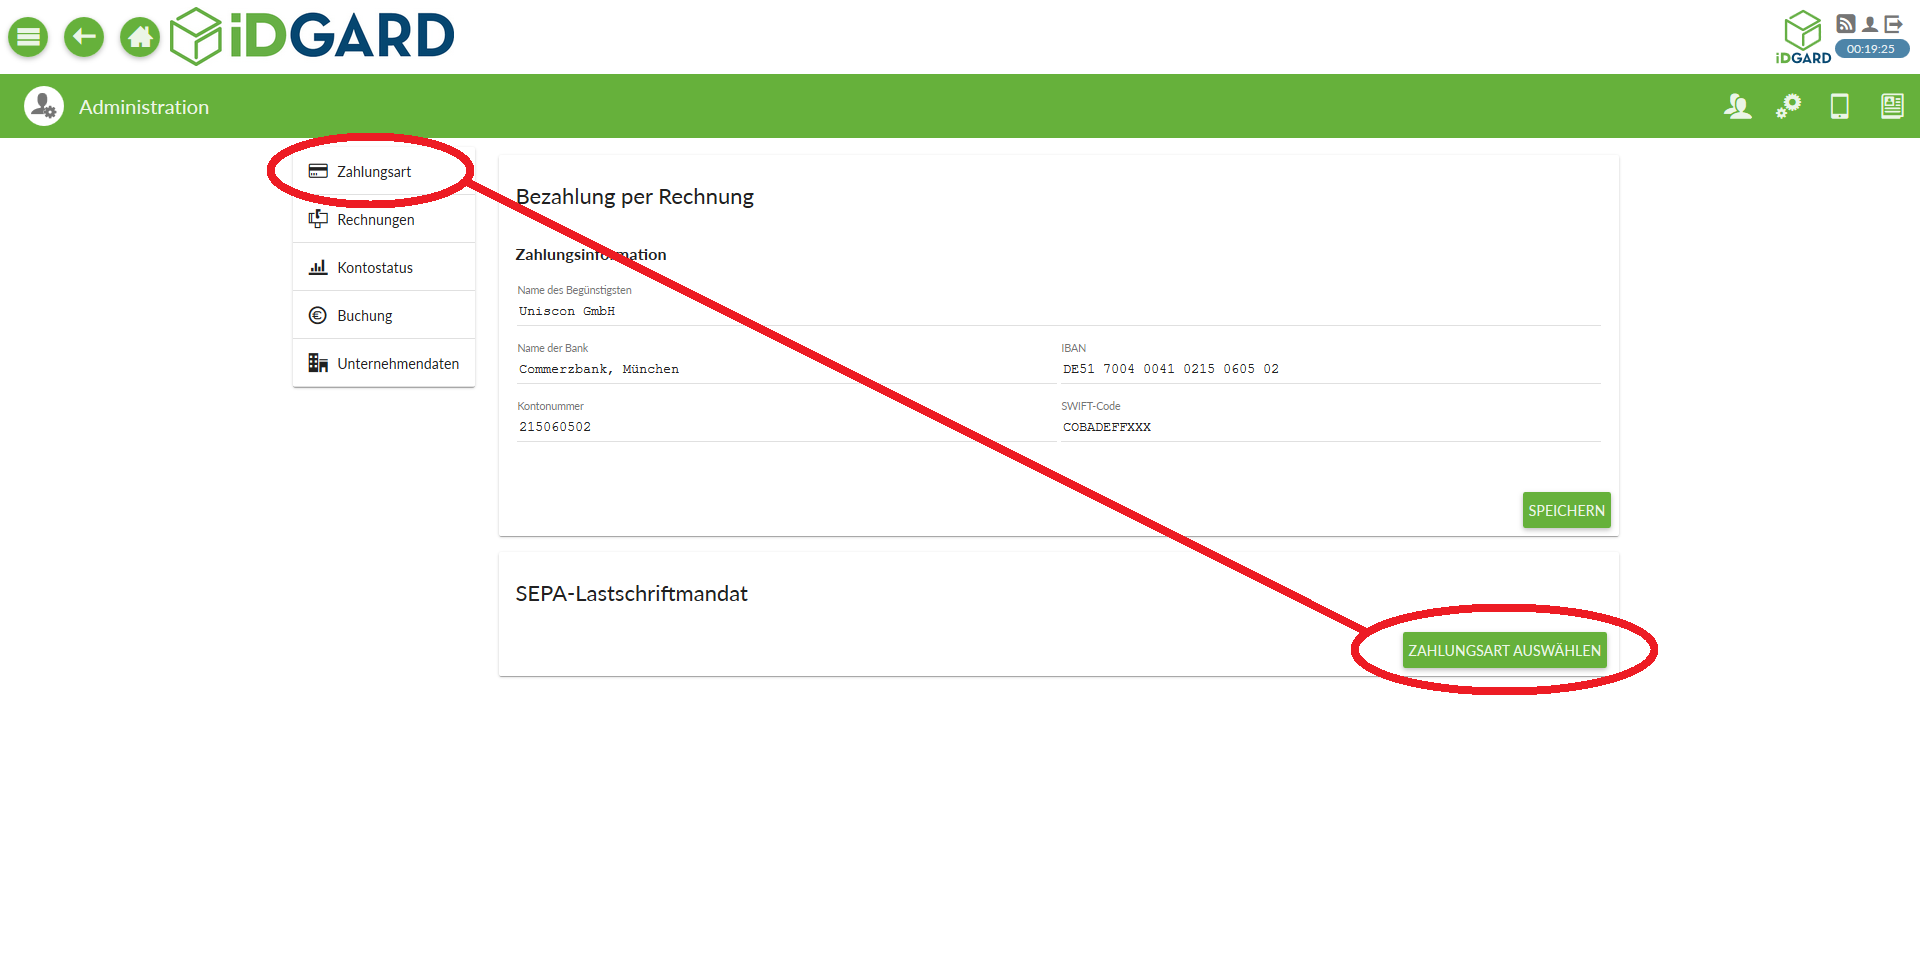 Admin-Tools: Zahlungsart